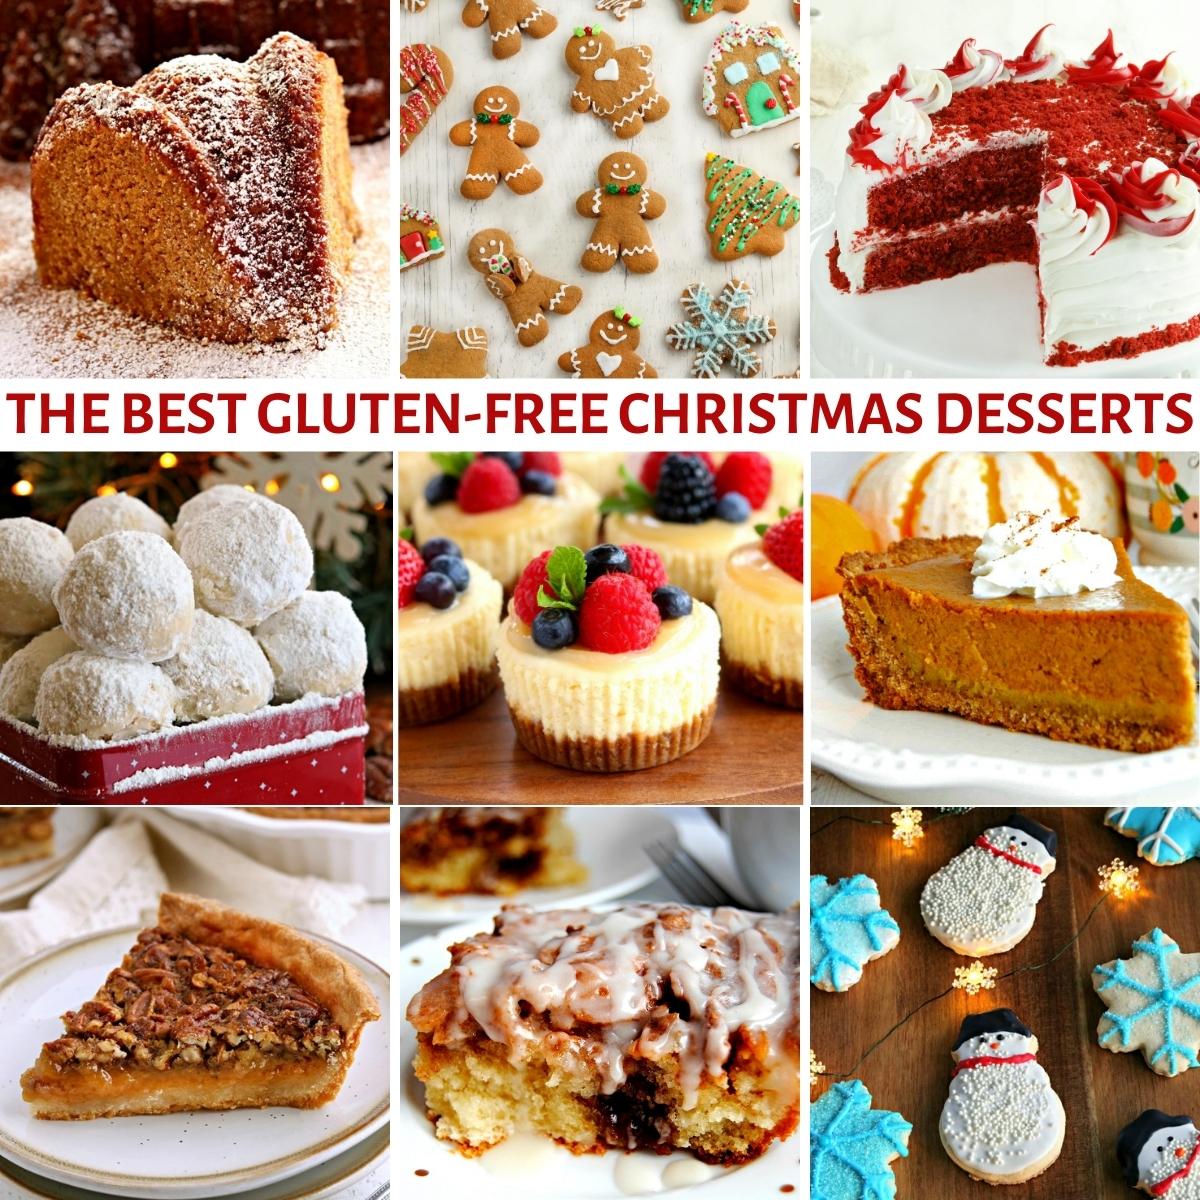 gluten-free Christmas desserts photo collage